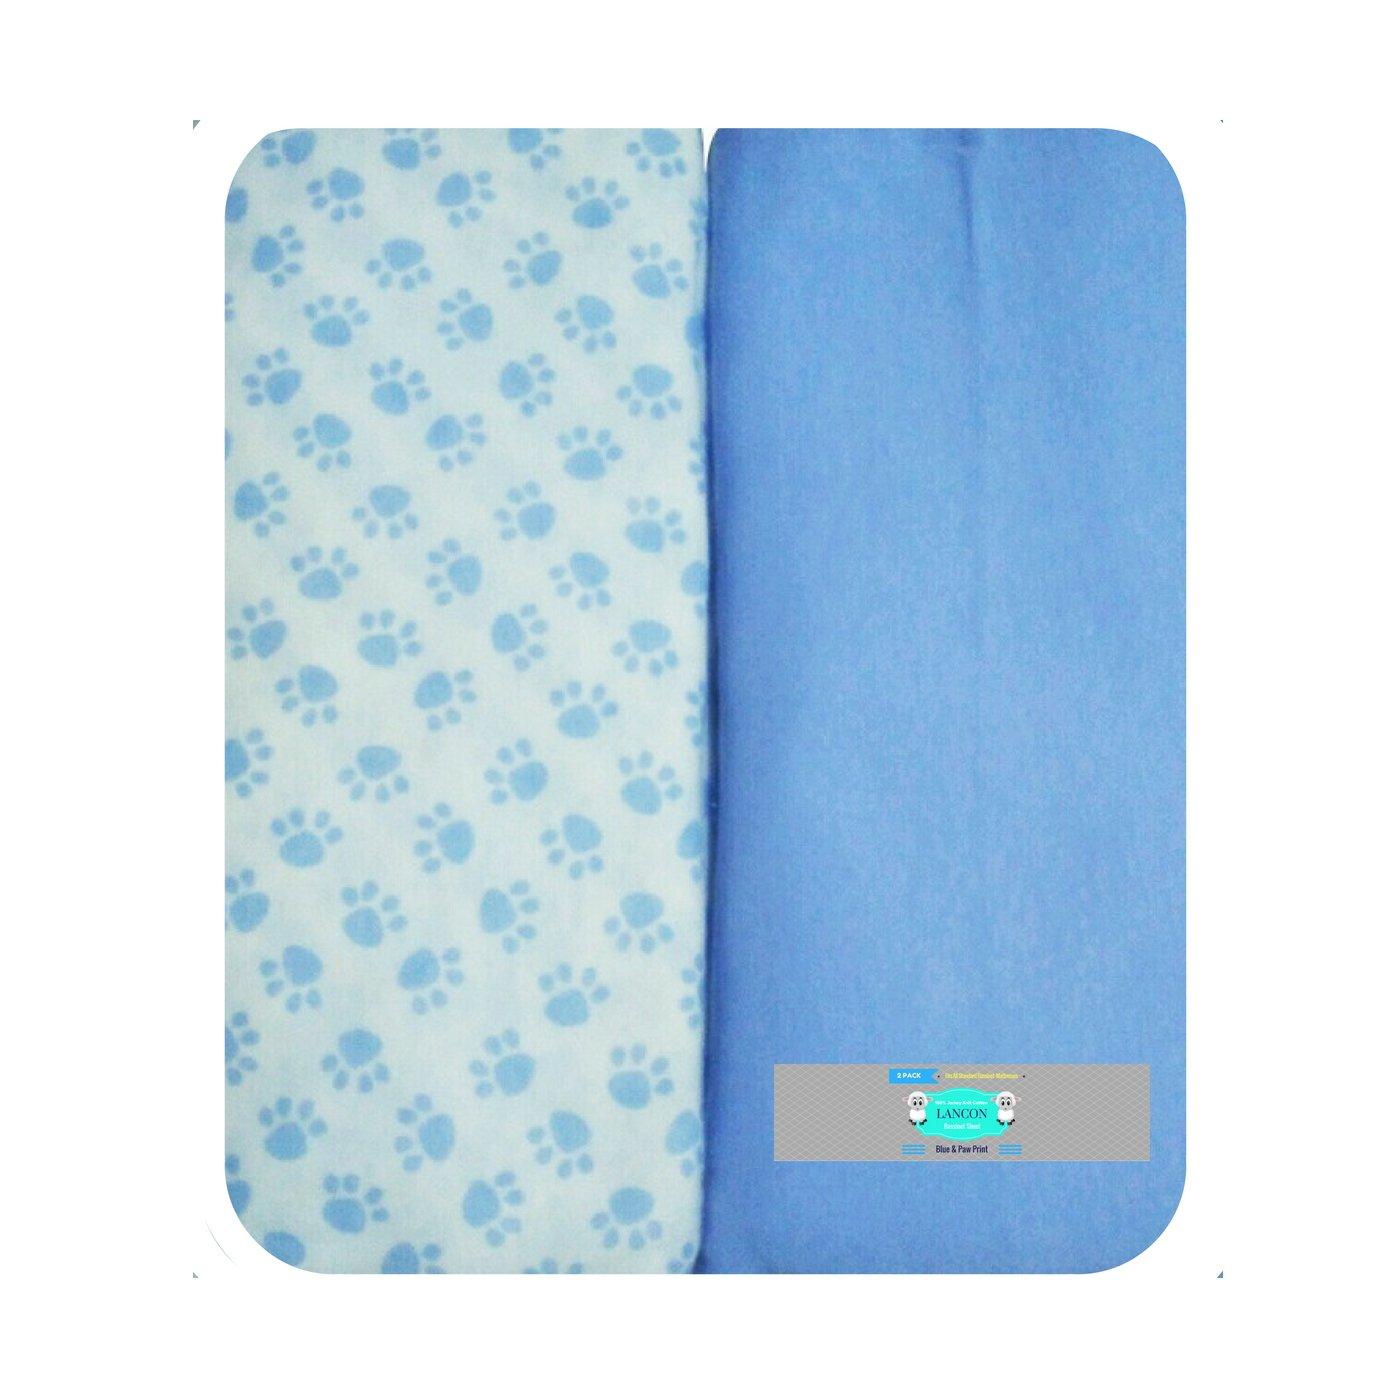 Bassinet Sheet Set by LANCON Kids - 2 Pack 100% Jersey Knit Cotton (Blue & Paw Print)